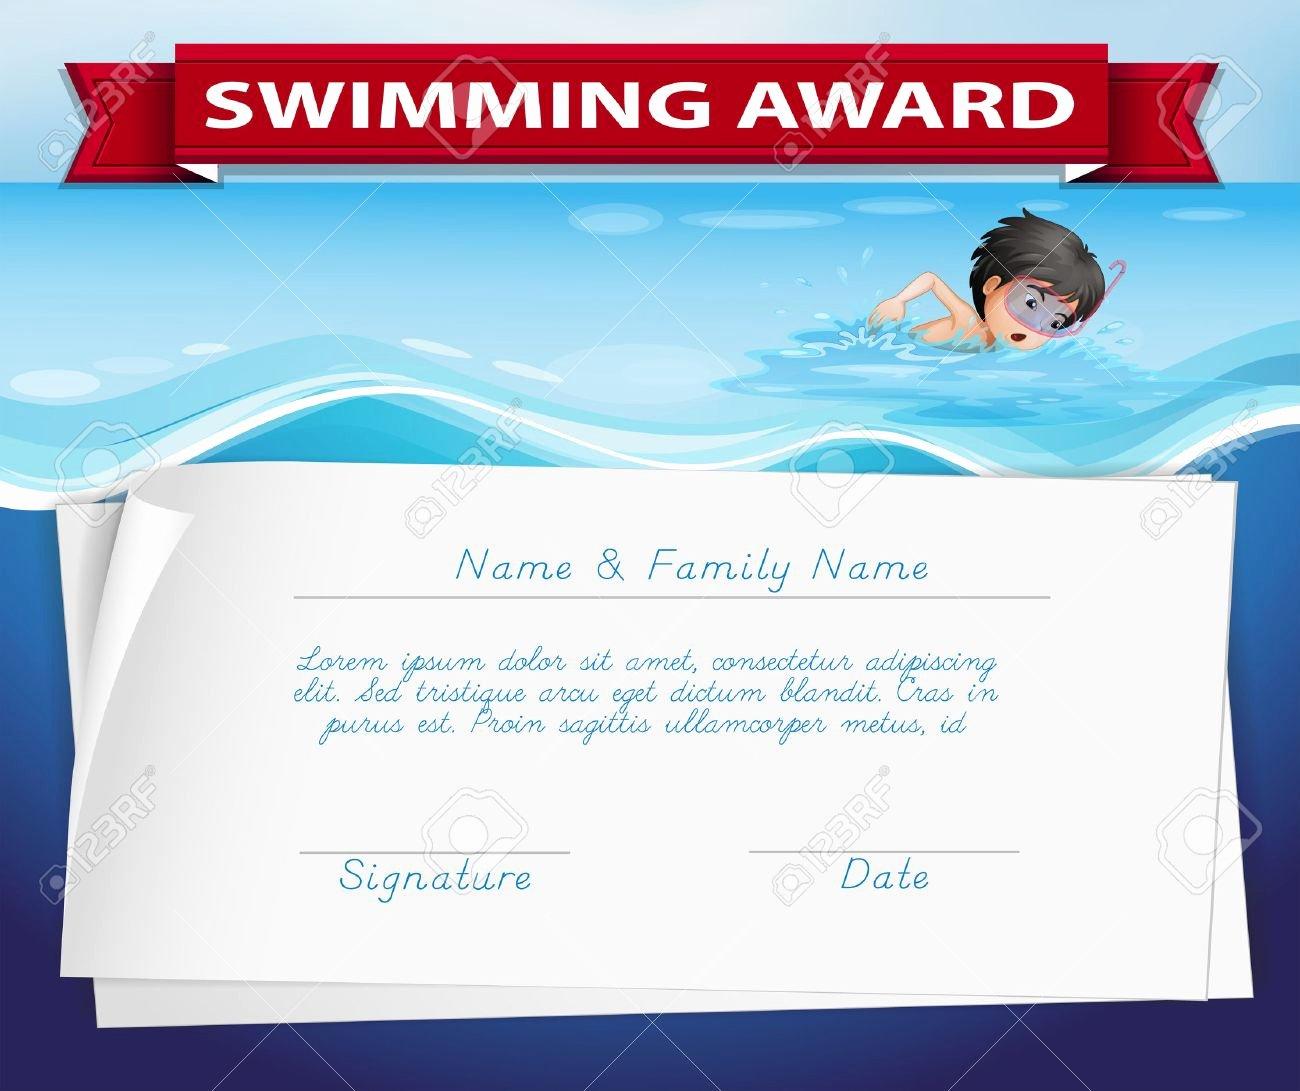 Swimming Certificate Template Free Fresh Swimming Certificate Template Free